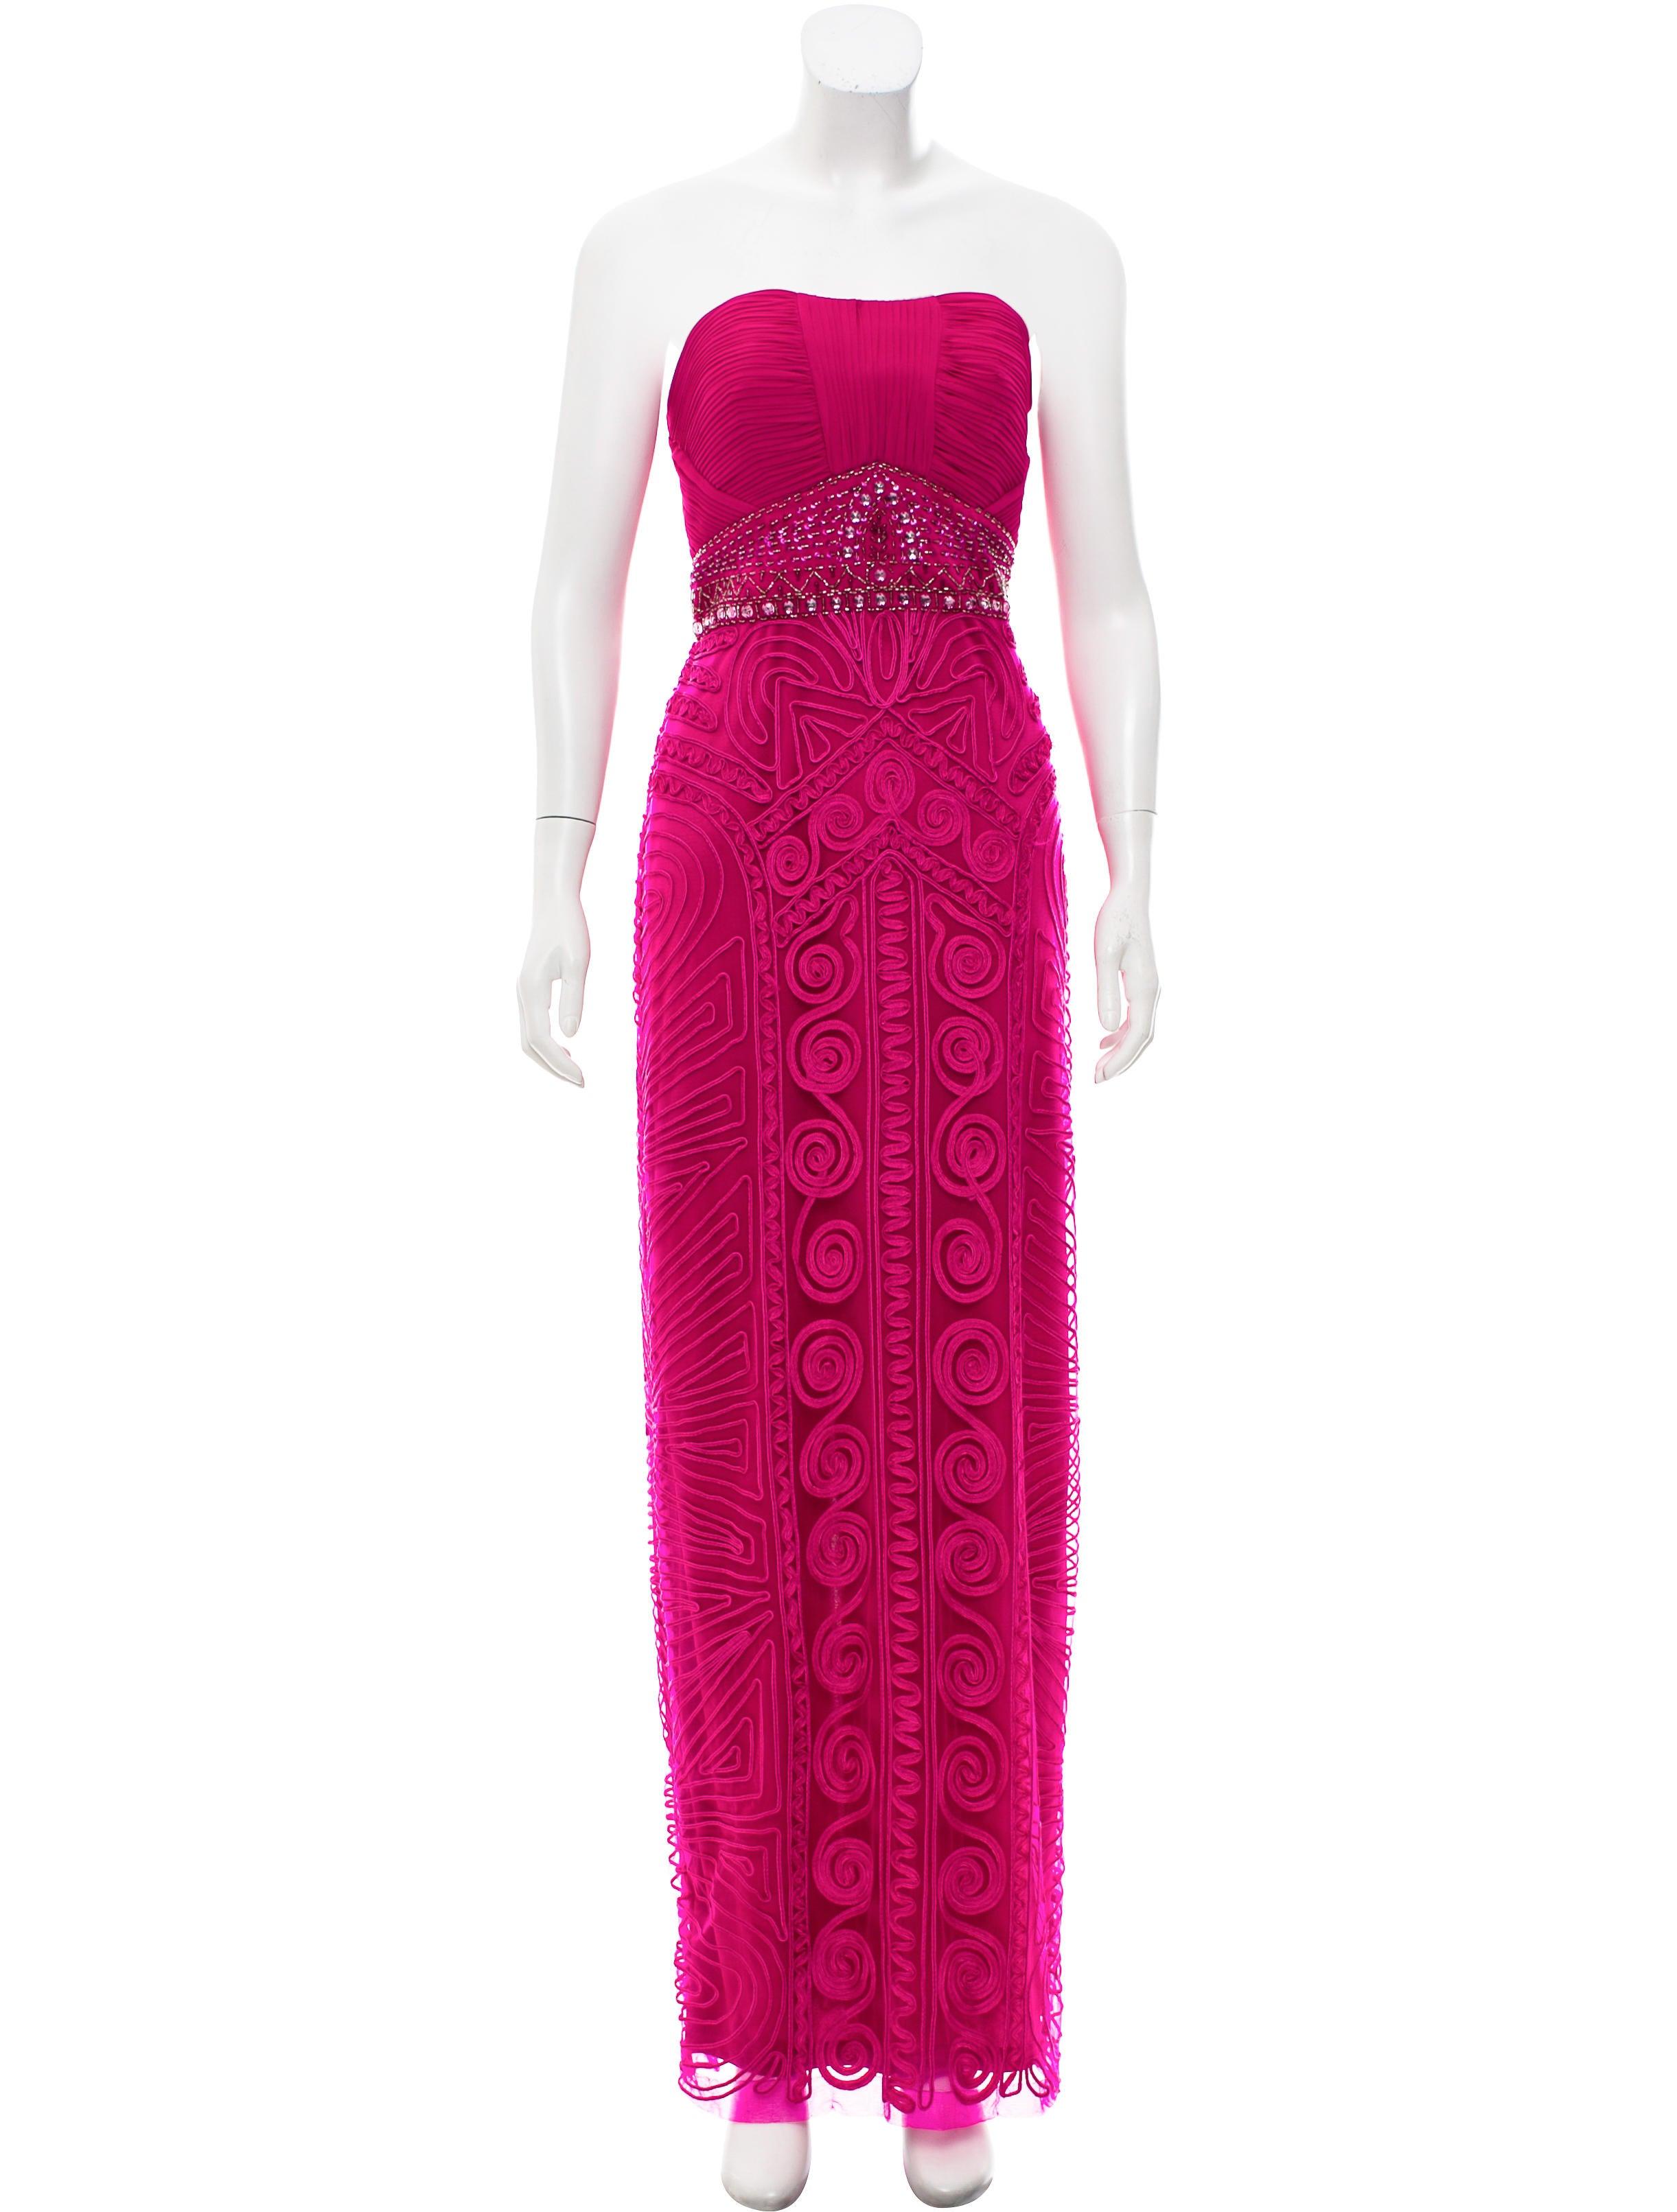 Sue Wong Embellished Evening Dress - Clothing - WSQ20179   The RealReal